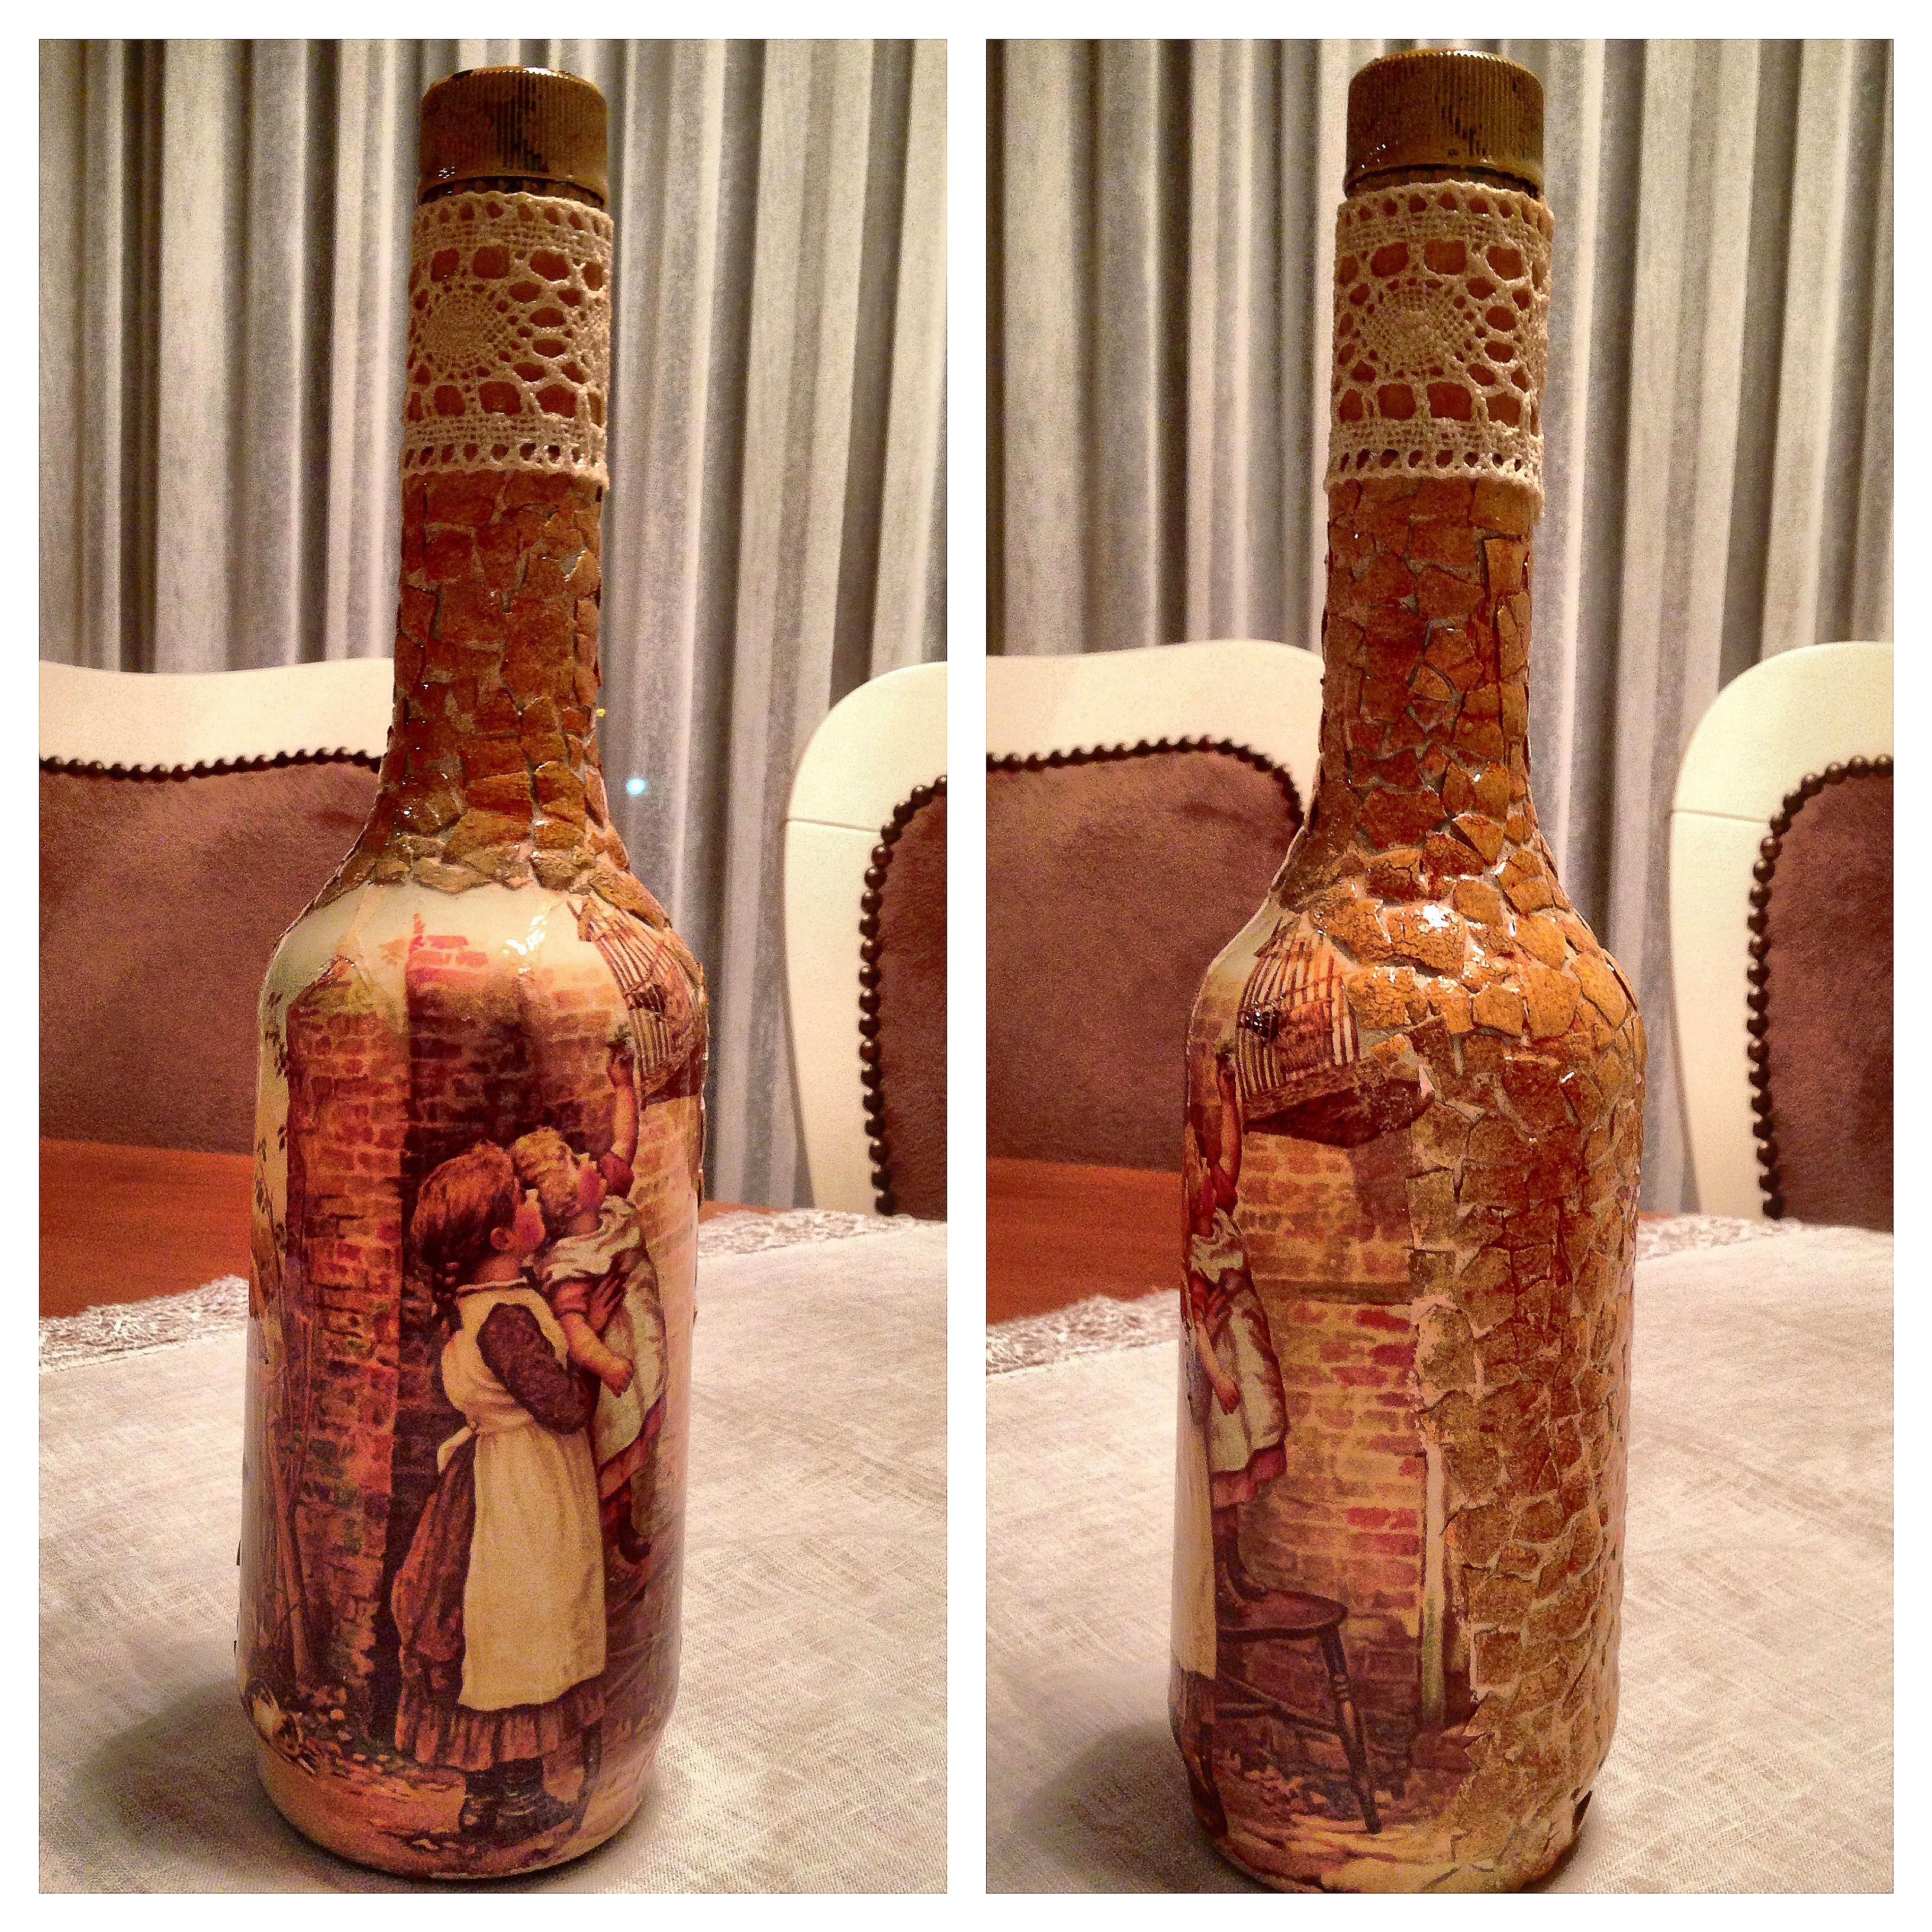 Bottle Painting Sise Boyama Yumurta Kabugu Calismasi Painting